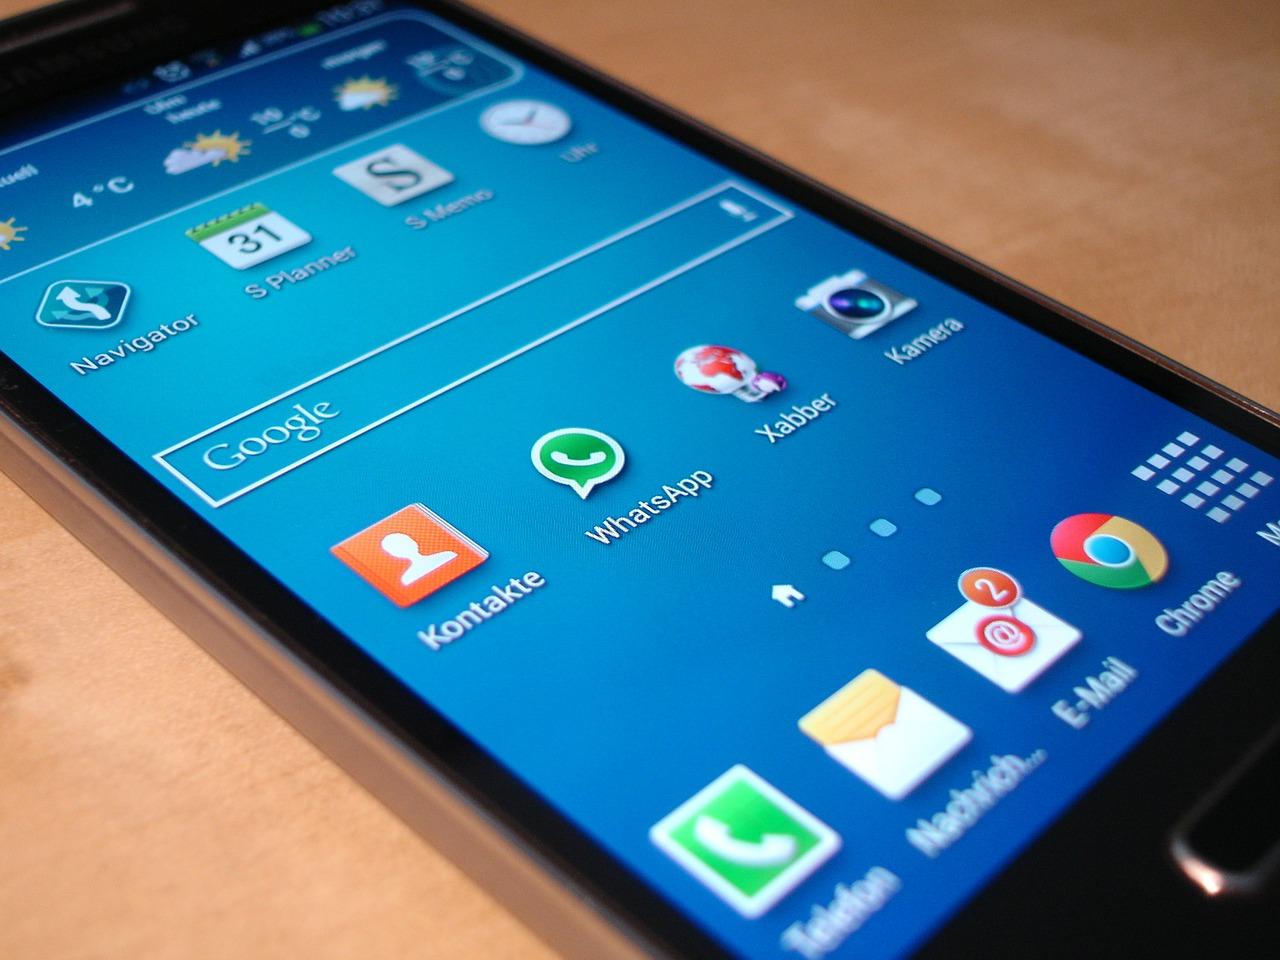 smartphone-325484_1280.jpg